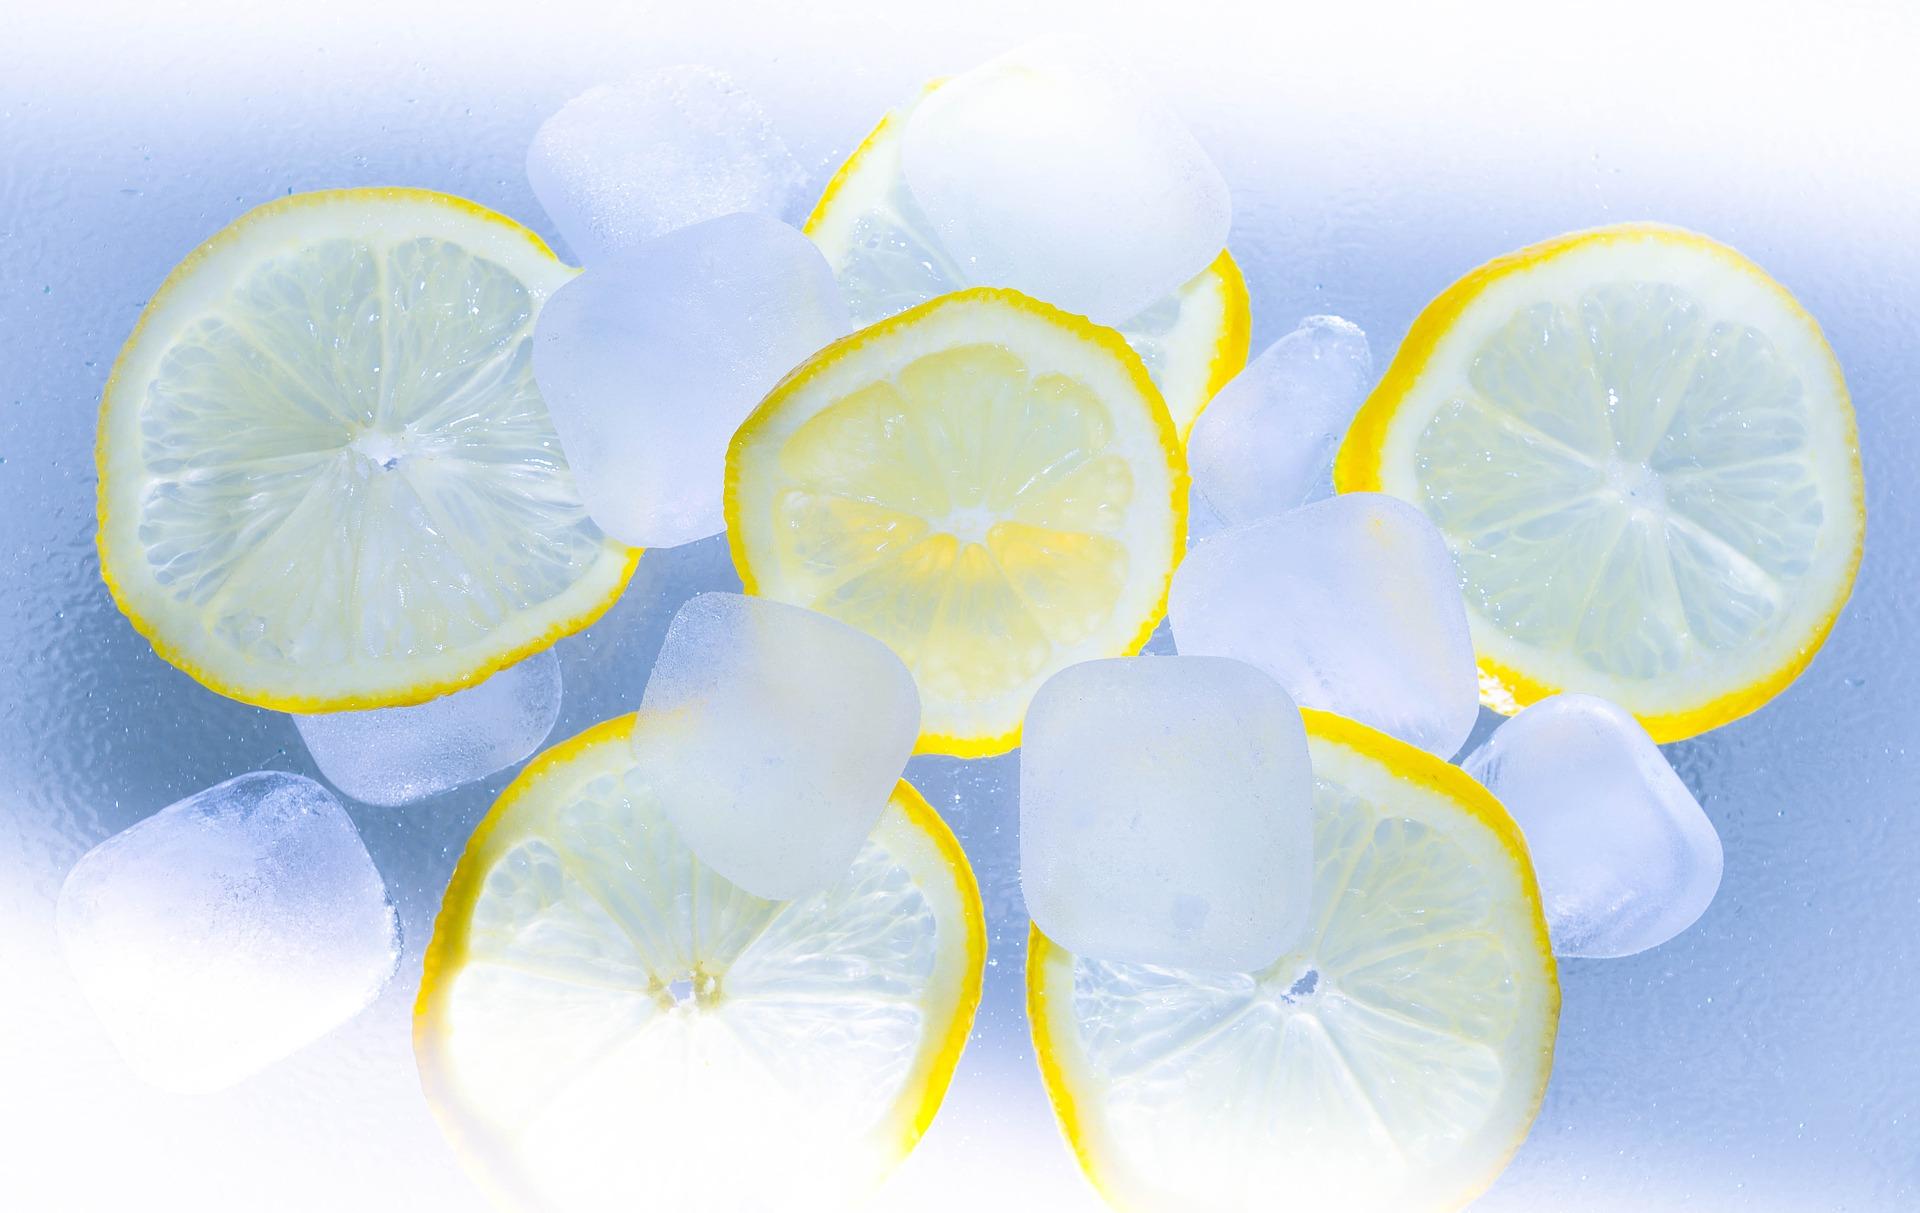 lamaie congelata - sfatulparintilor.ro - pixabay_com